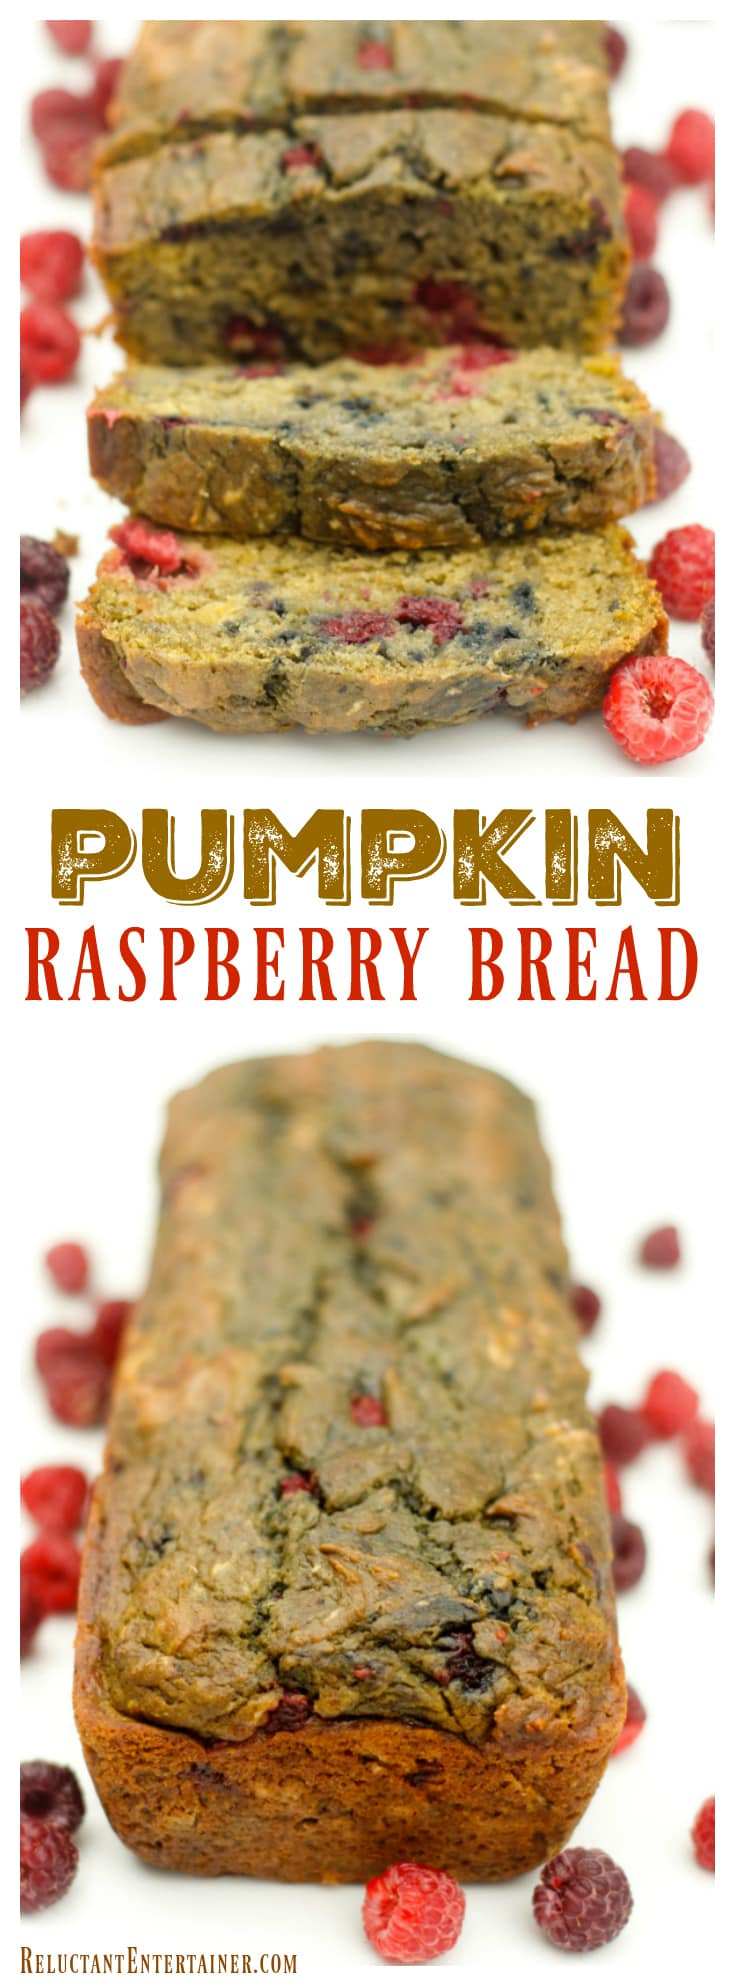 Pumpkin Raspberry Bread